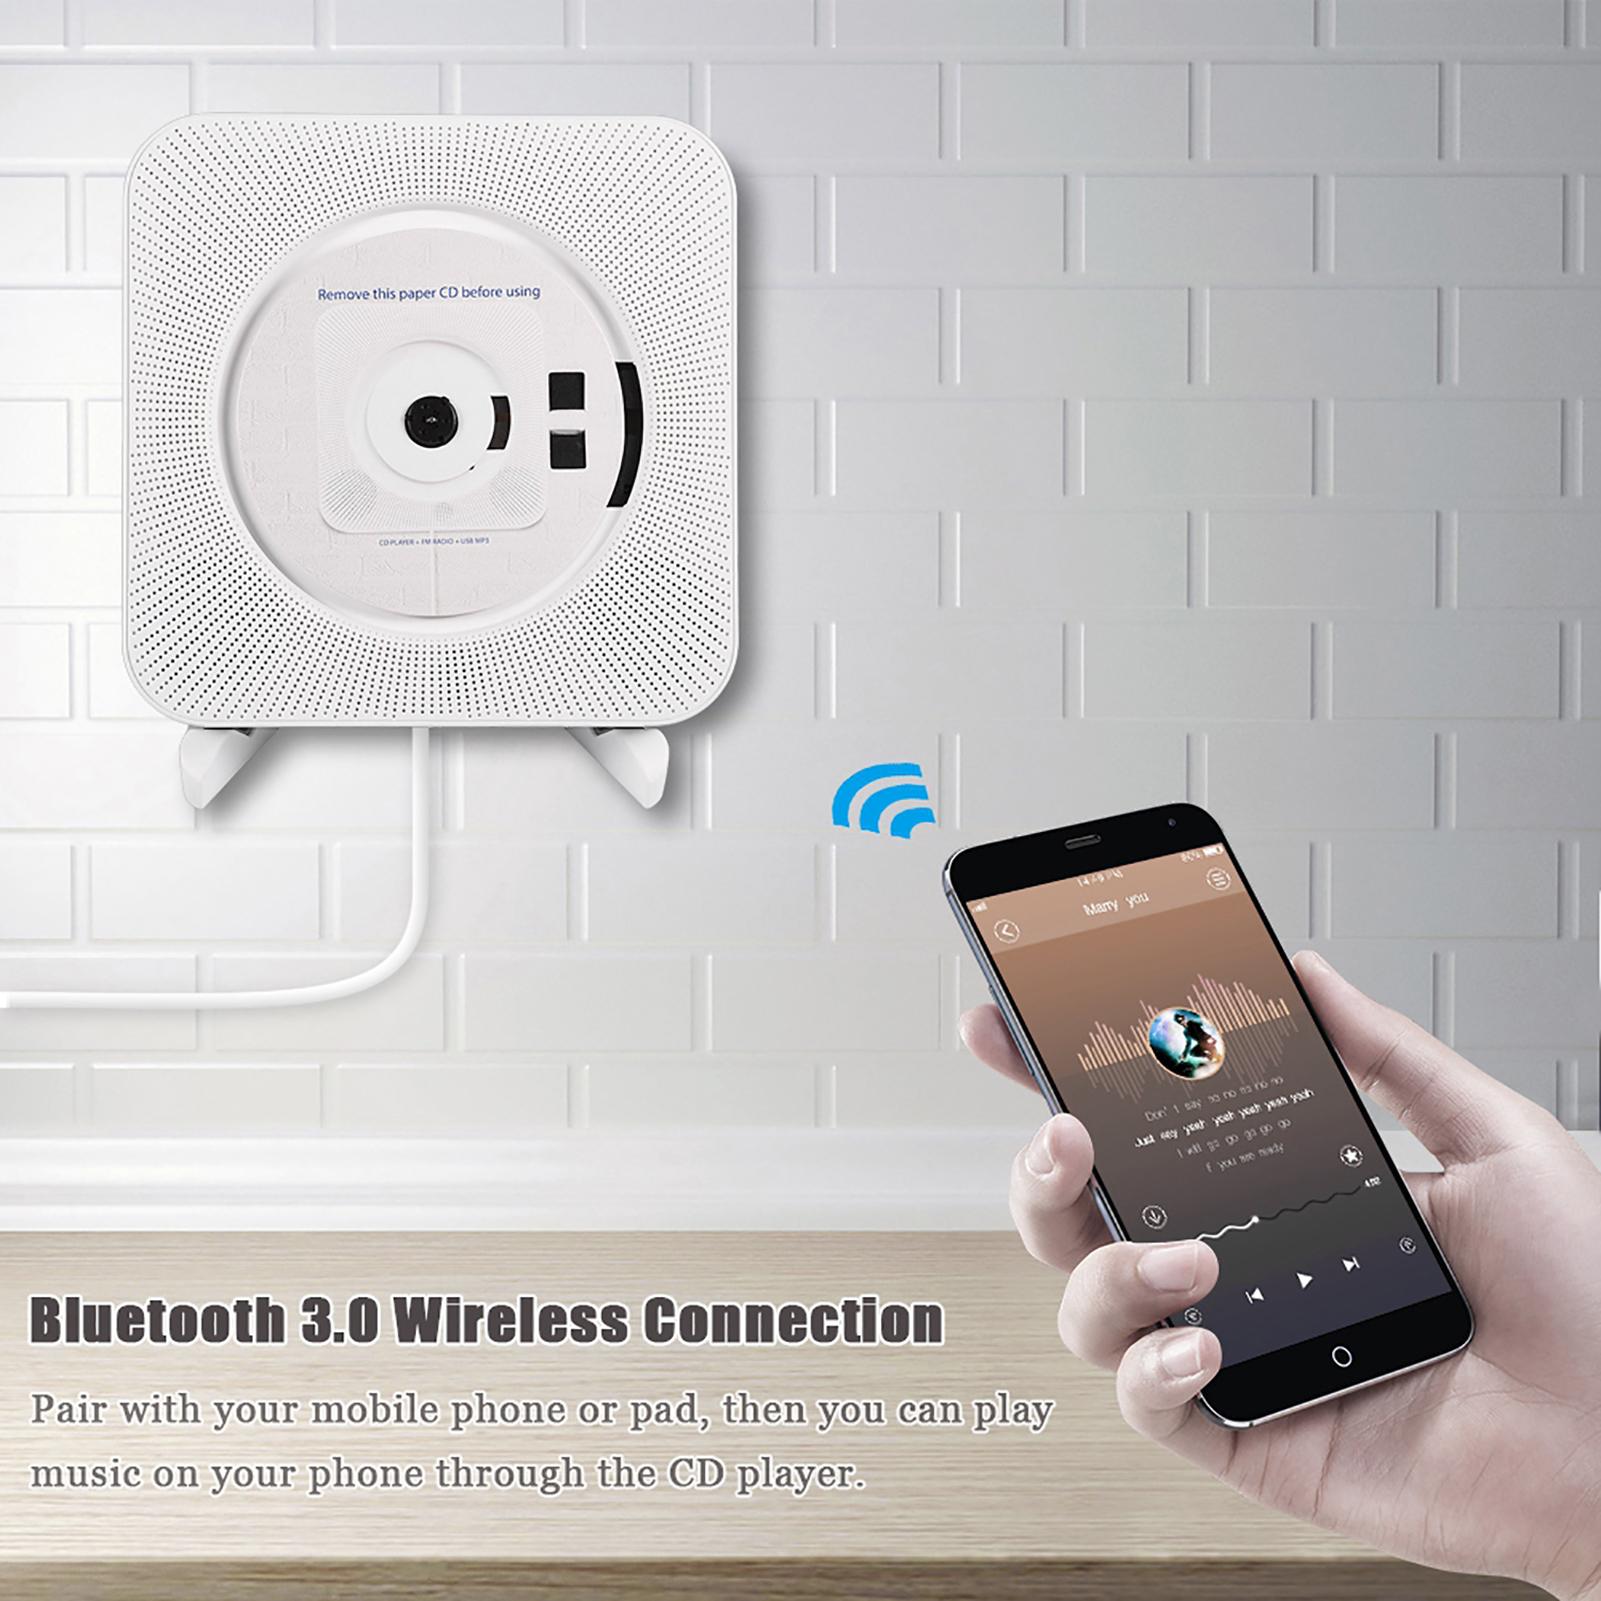 portable lecteur cd bluetooth 3 0 sans fil audio st r o usb mural blanc plug eu ebay. Black Bedroom Furniture Sets. Home Design Ideas